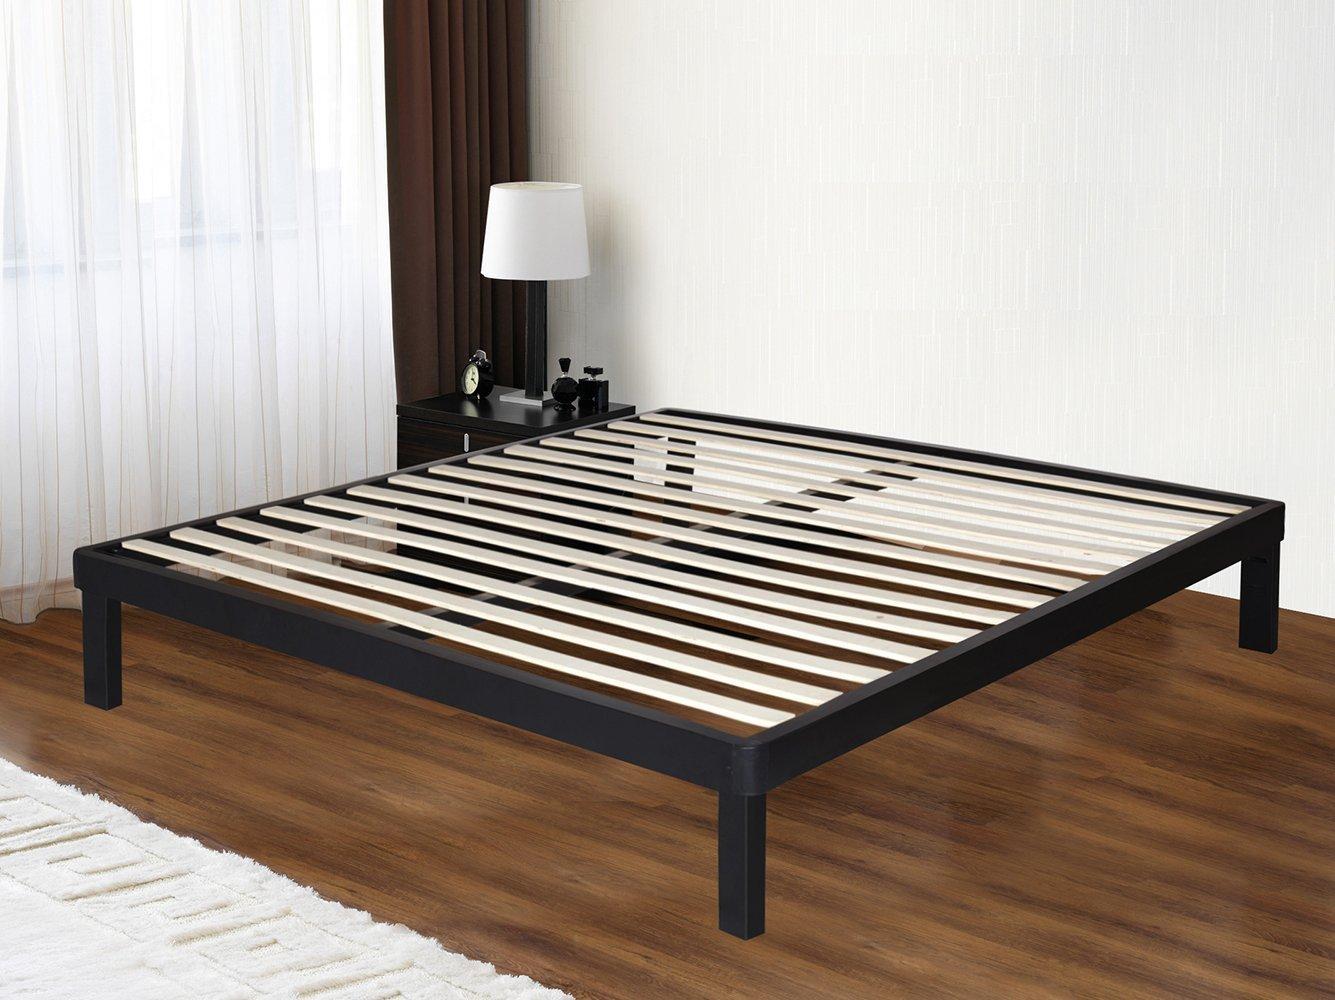 Olee Sleep 14 Inch Tall Dura Metal Wood Slat Bed Frame Matress Foundation 14BF03 (Queen)